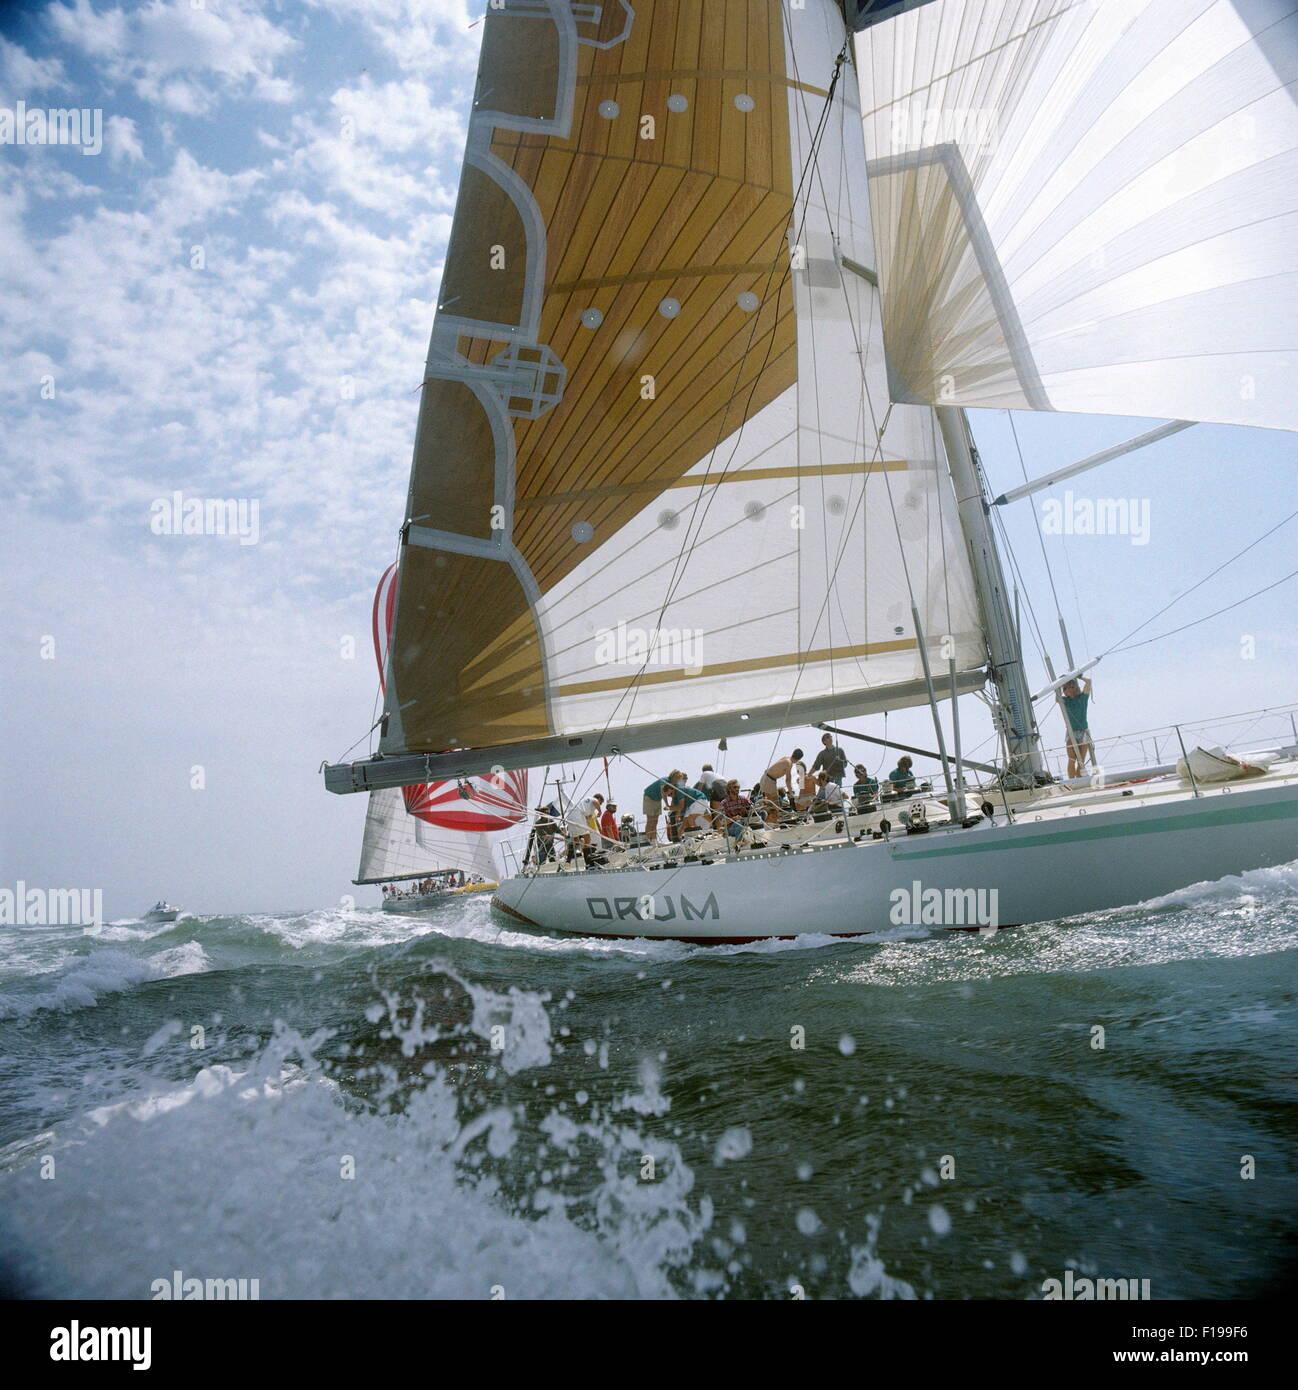 AJAXNETPHOTO. 1985. SOLENT, en Angleterre. - WHITBREAD ROUND THE WORLD RACE - SIMON LE BON AU TAMBOUR. YACHT EST Photo Stock